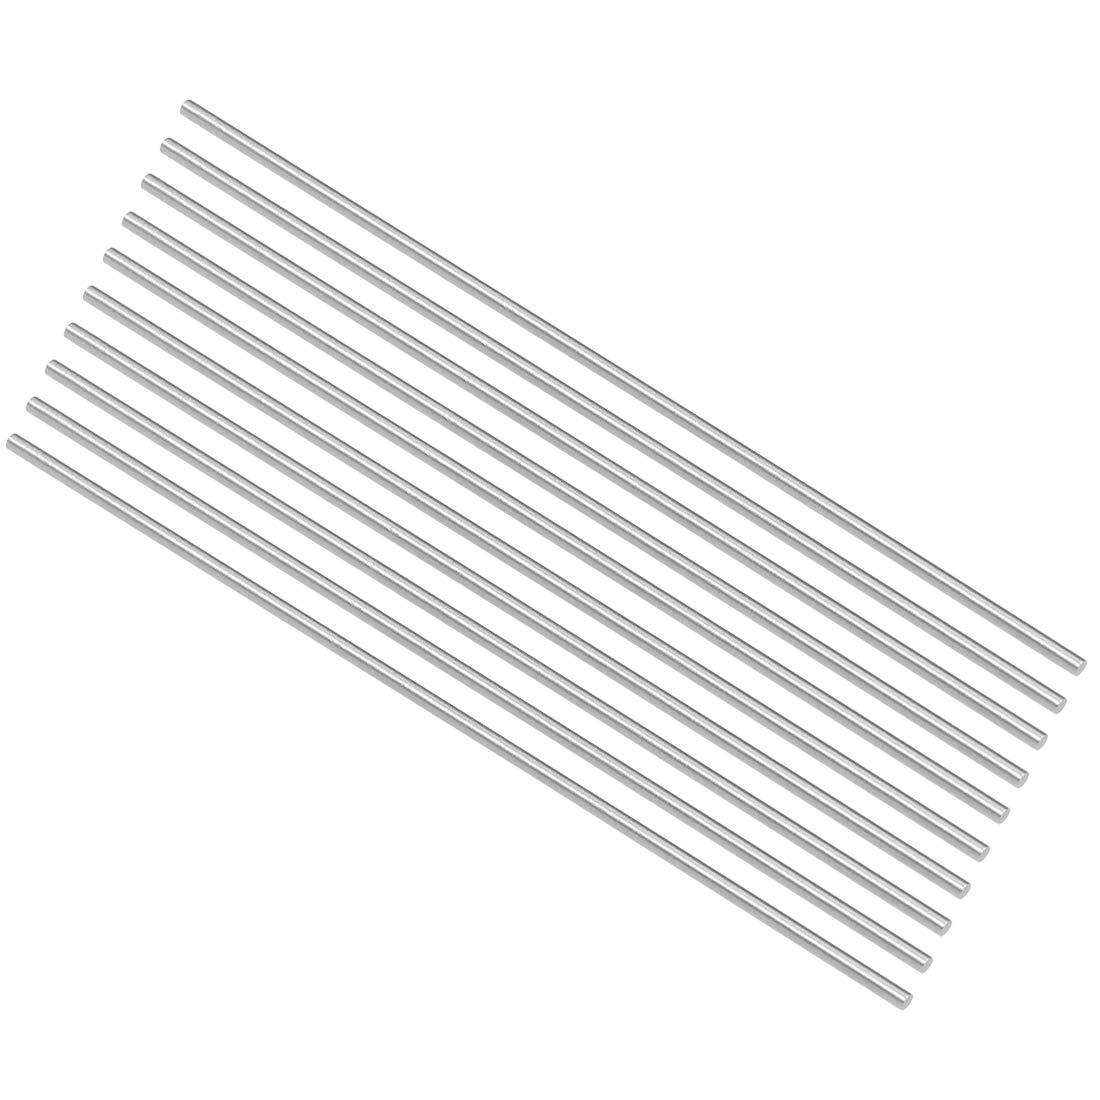 uxcell HSS Lathe Round Rod Solid Shaft Bar 2.9mm Dia 100mm Length 10Pcs